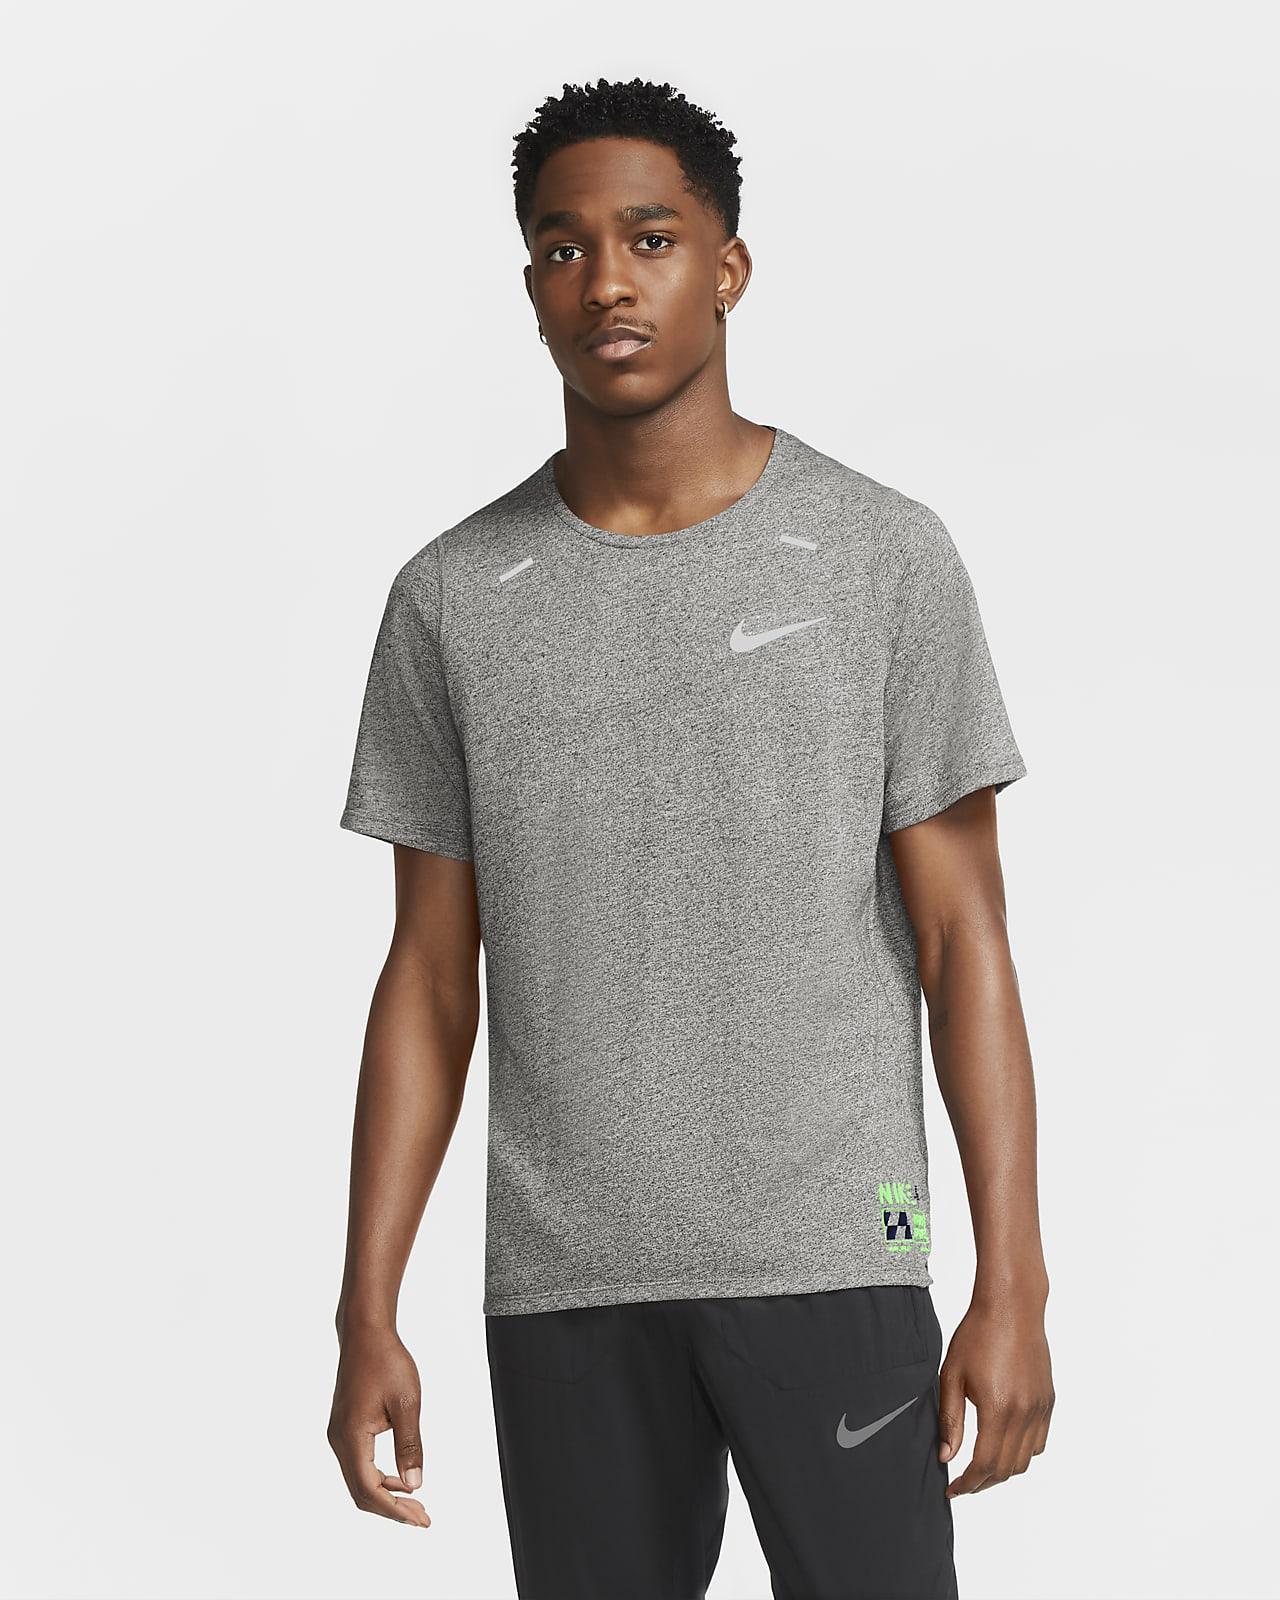 Camisola de running Nike Rise 365 Future Fast para homem